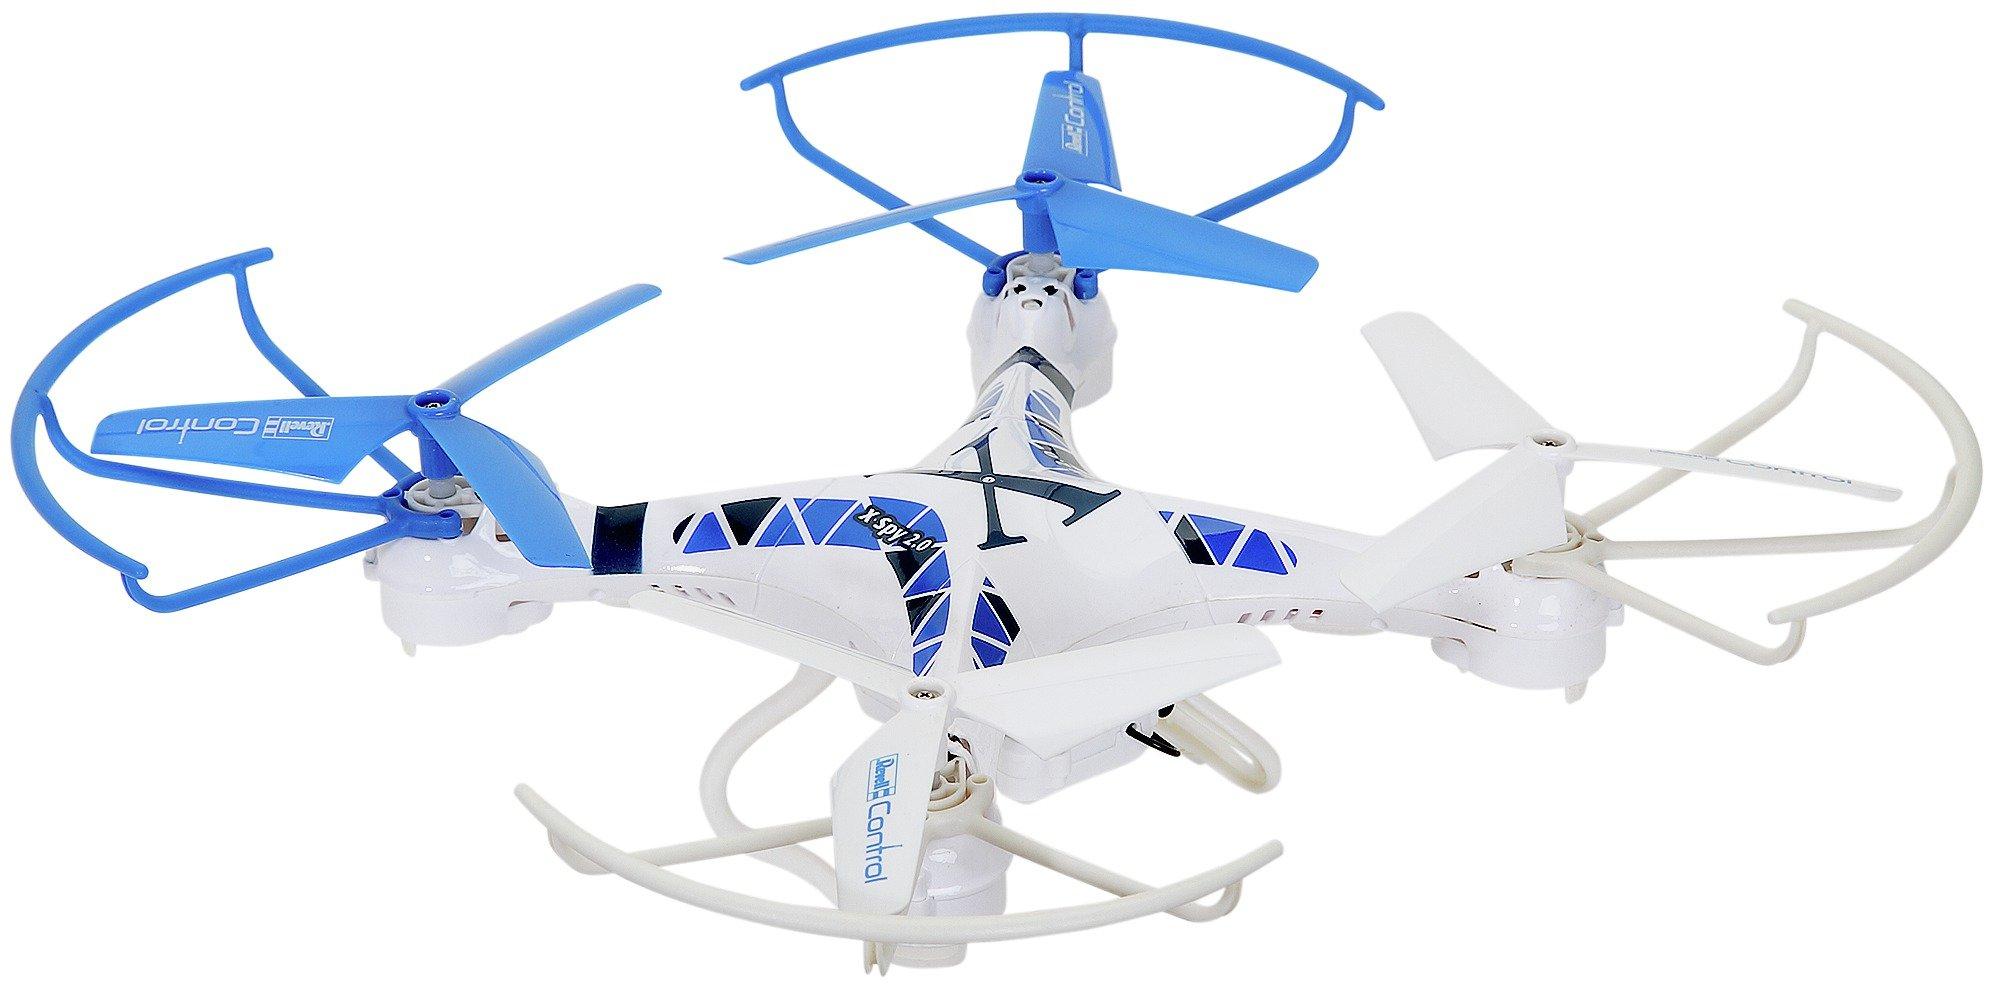 Revell Control X Spy 2.0 WiFi Video Drone.